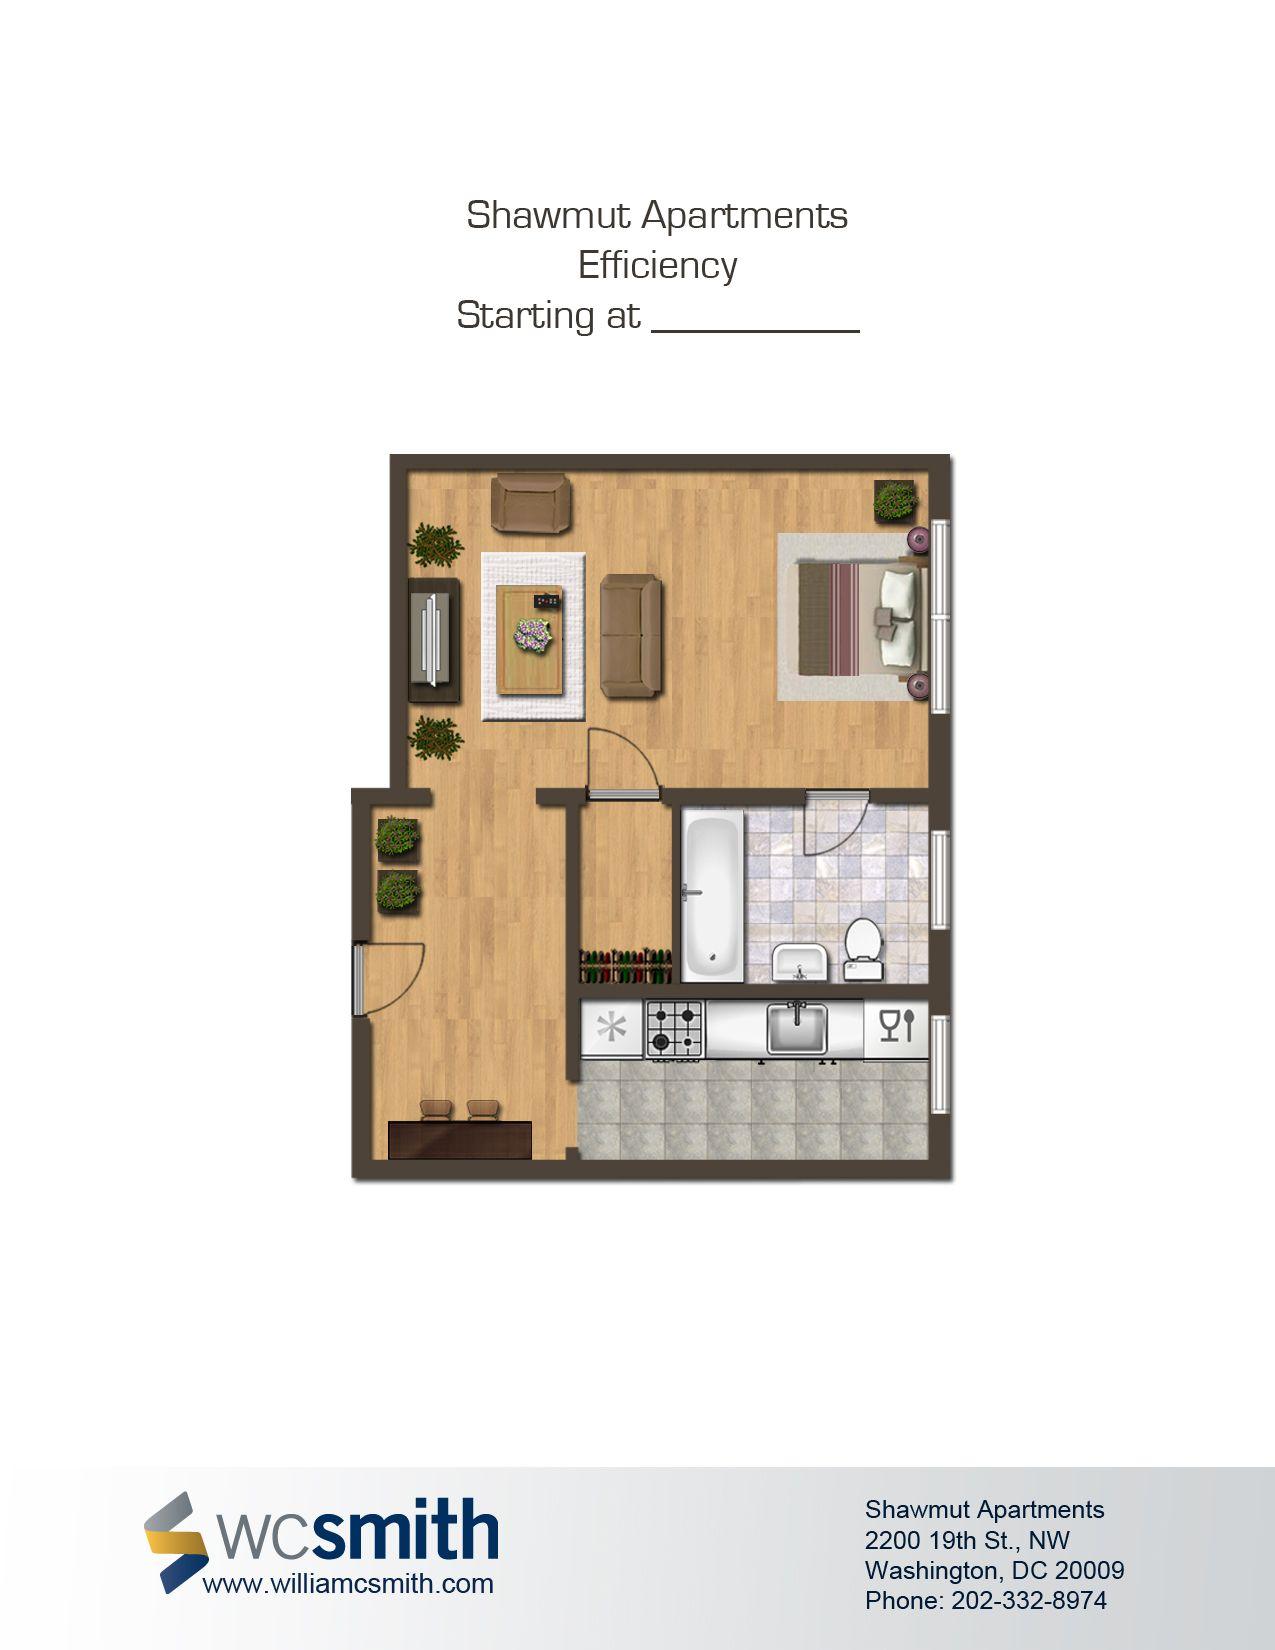 Shawmut Apartments in Adams Floor plans